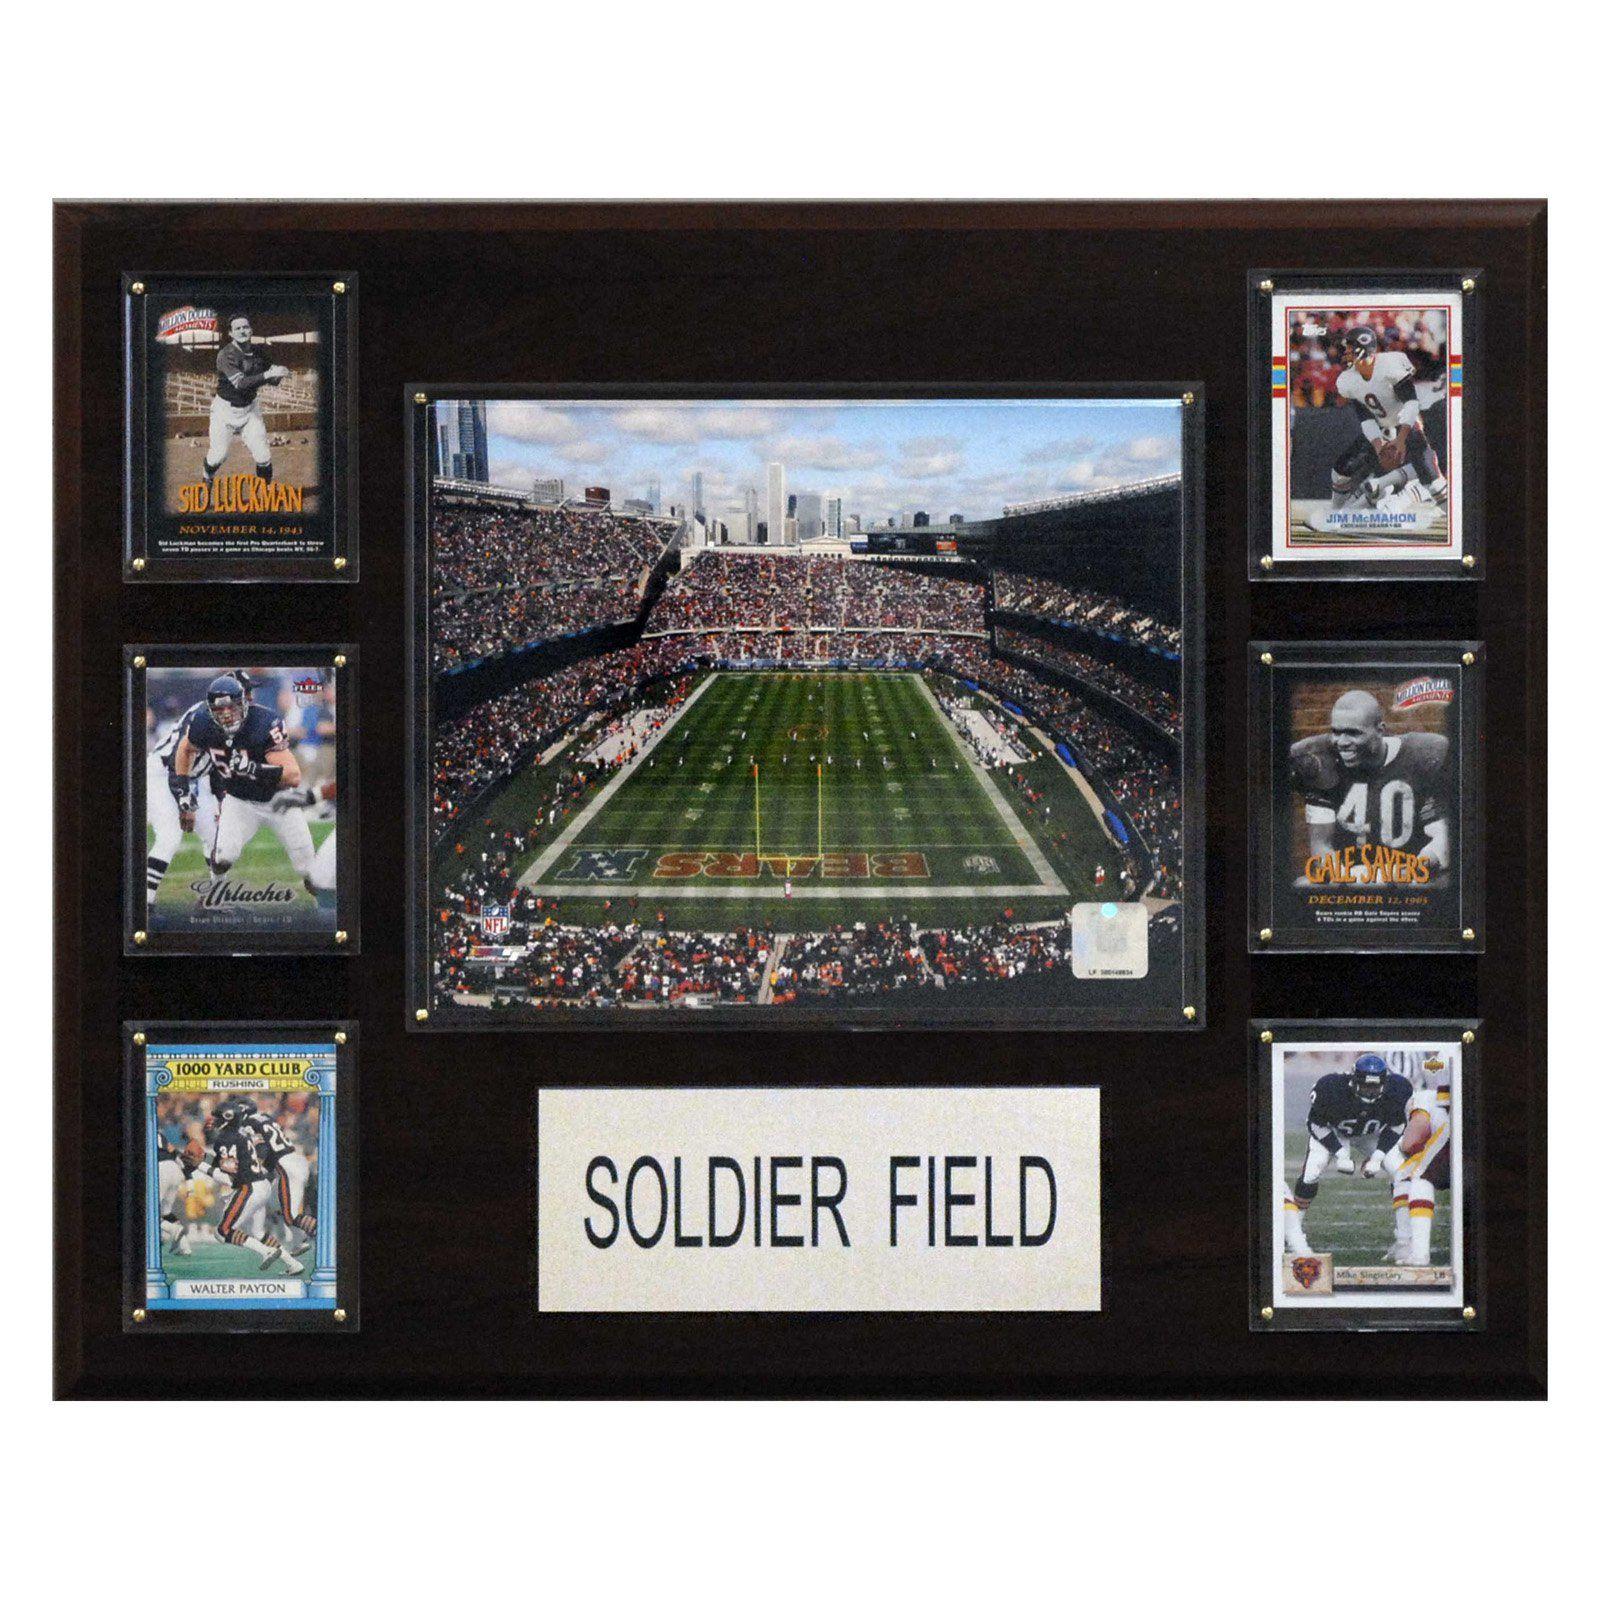 NFL Soldier Field Stadium Plaque